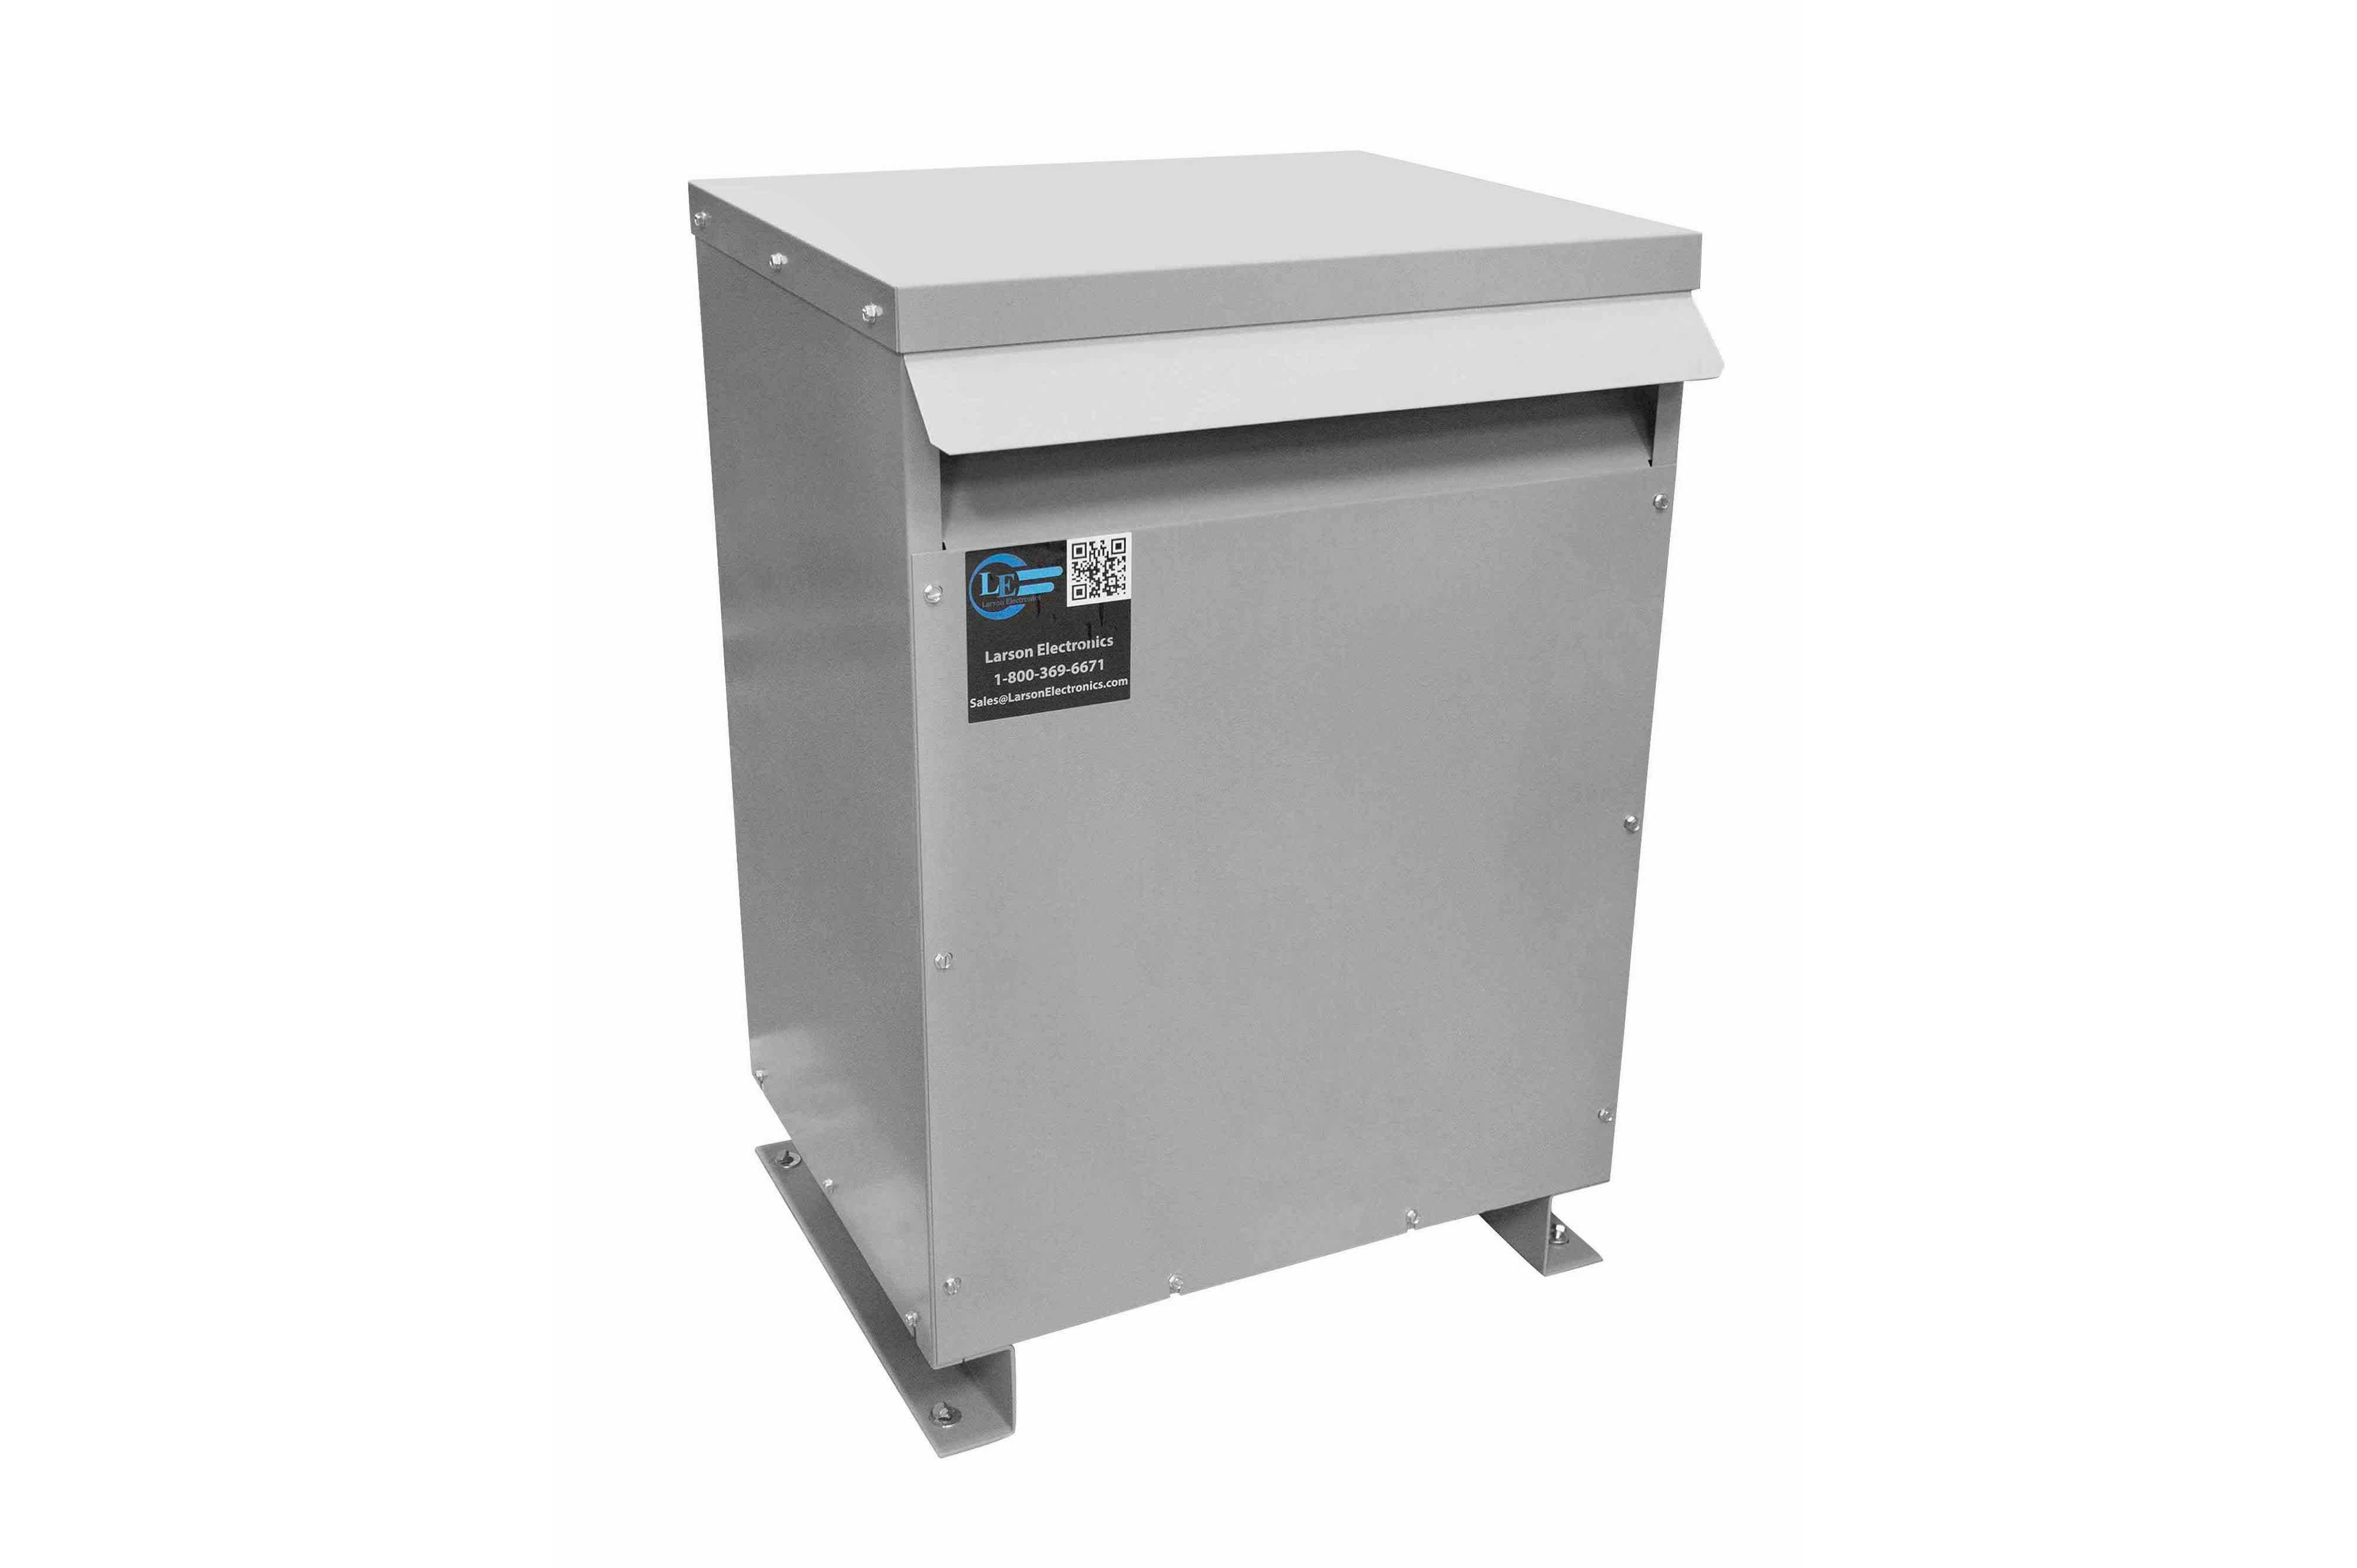 200 kVA 3PH Isolation Transformer, 208V Wye Primary, 208Y/120 Wye-N Secondary, N3R, Ventilated, 60 Hz